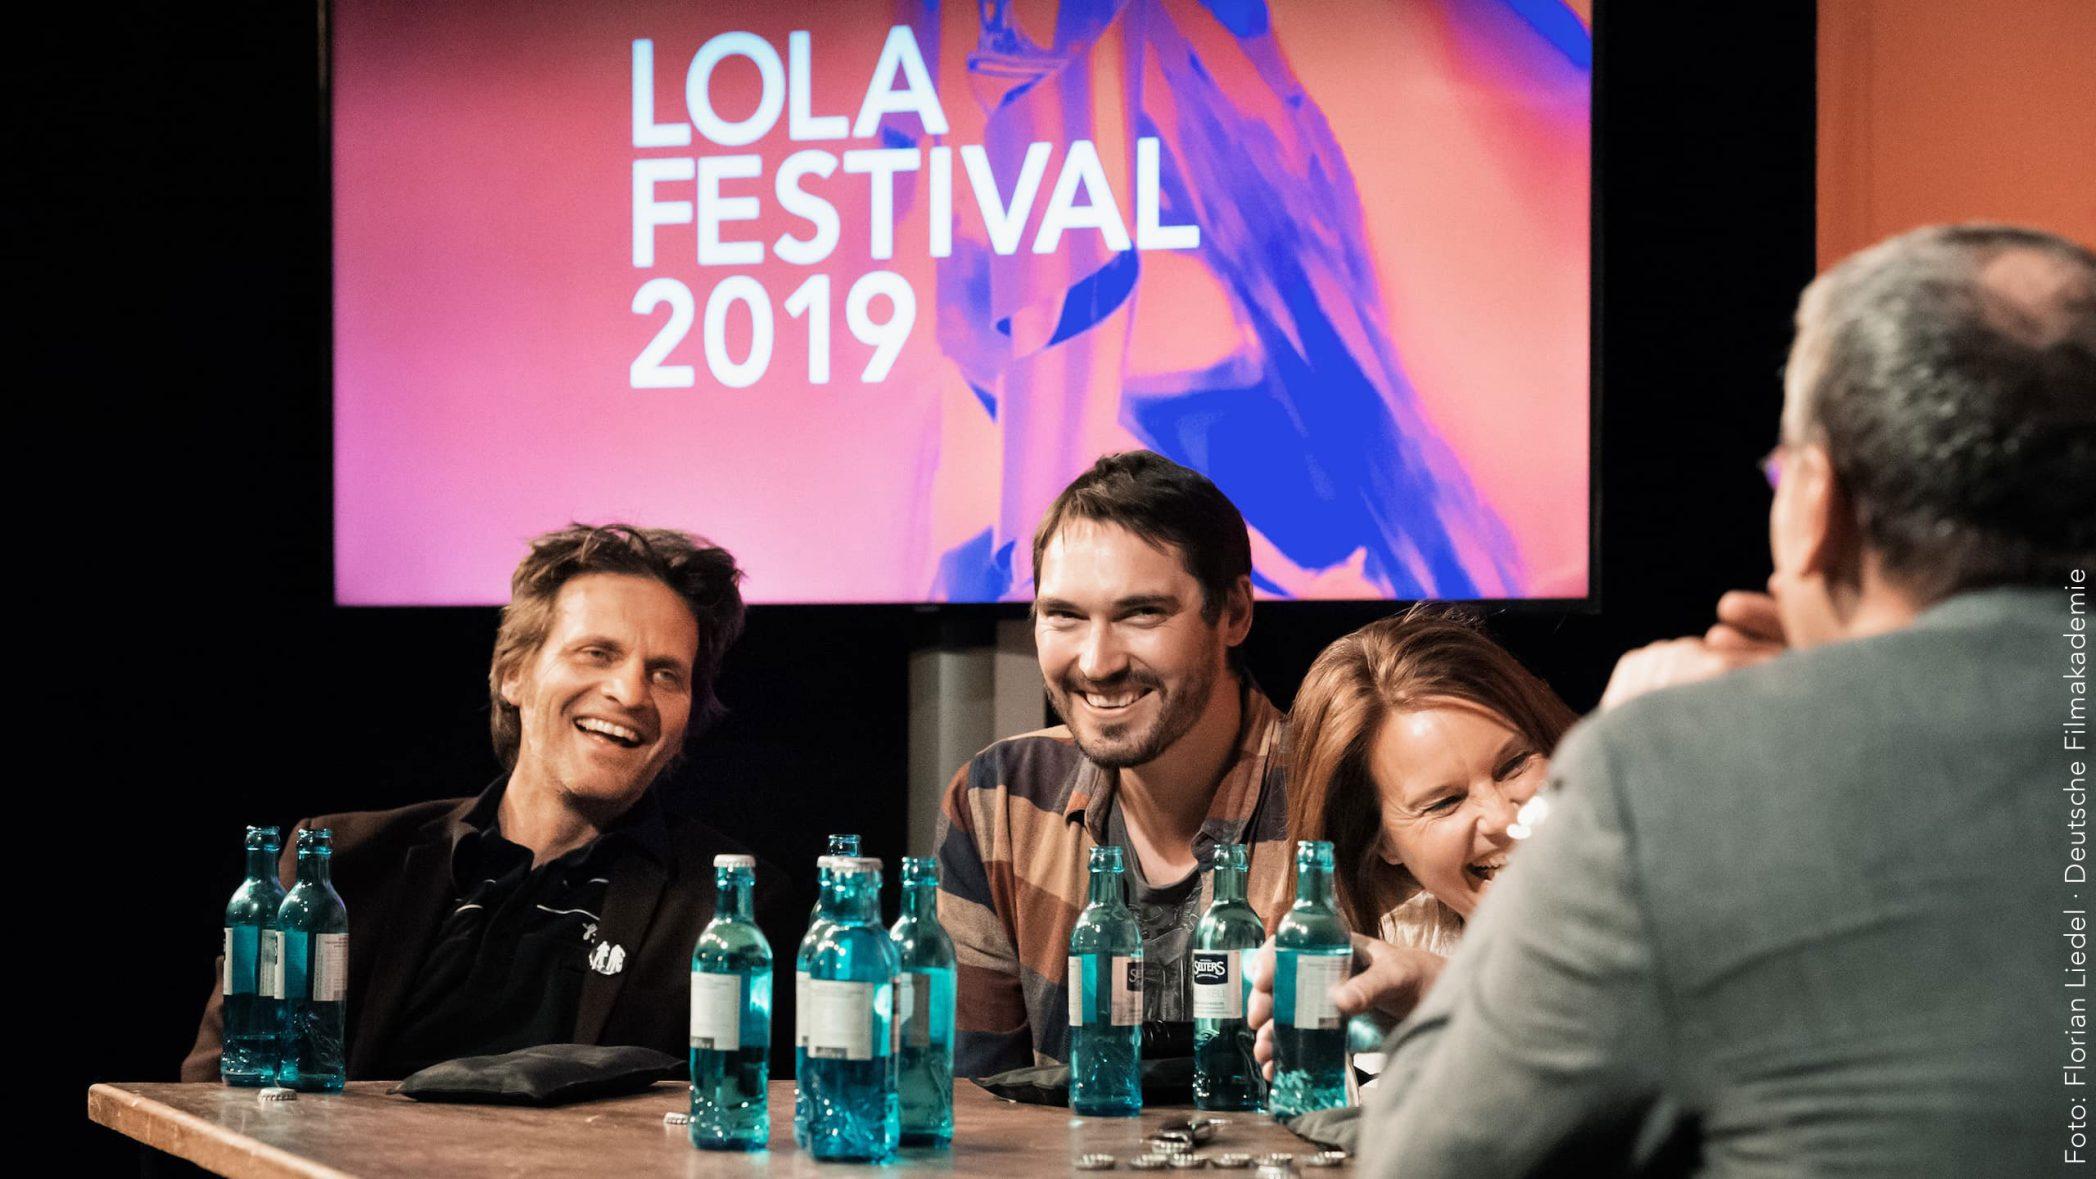 Markus Goller, Aaron Lehmann, Caroline Link, Regie, Regisseure